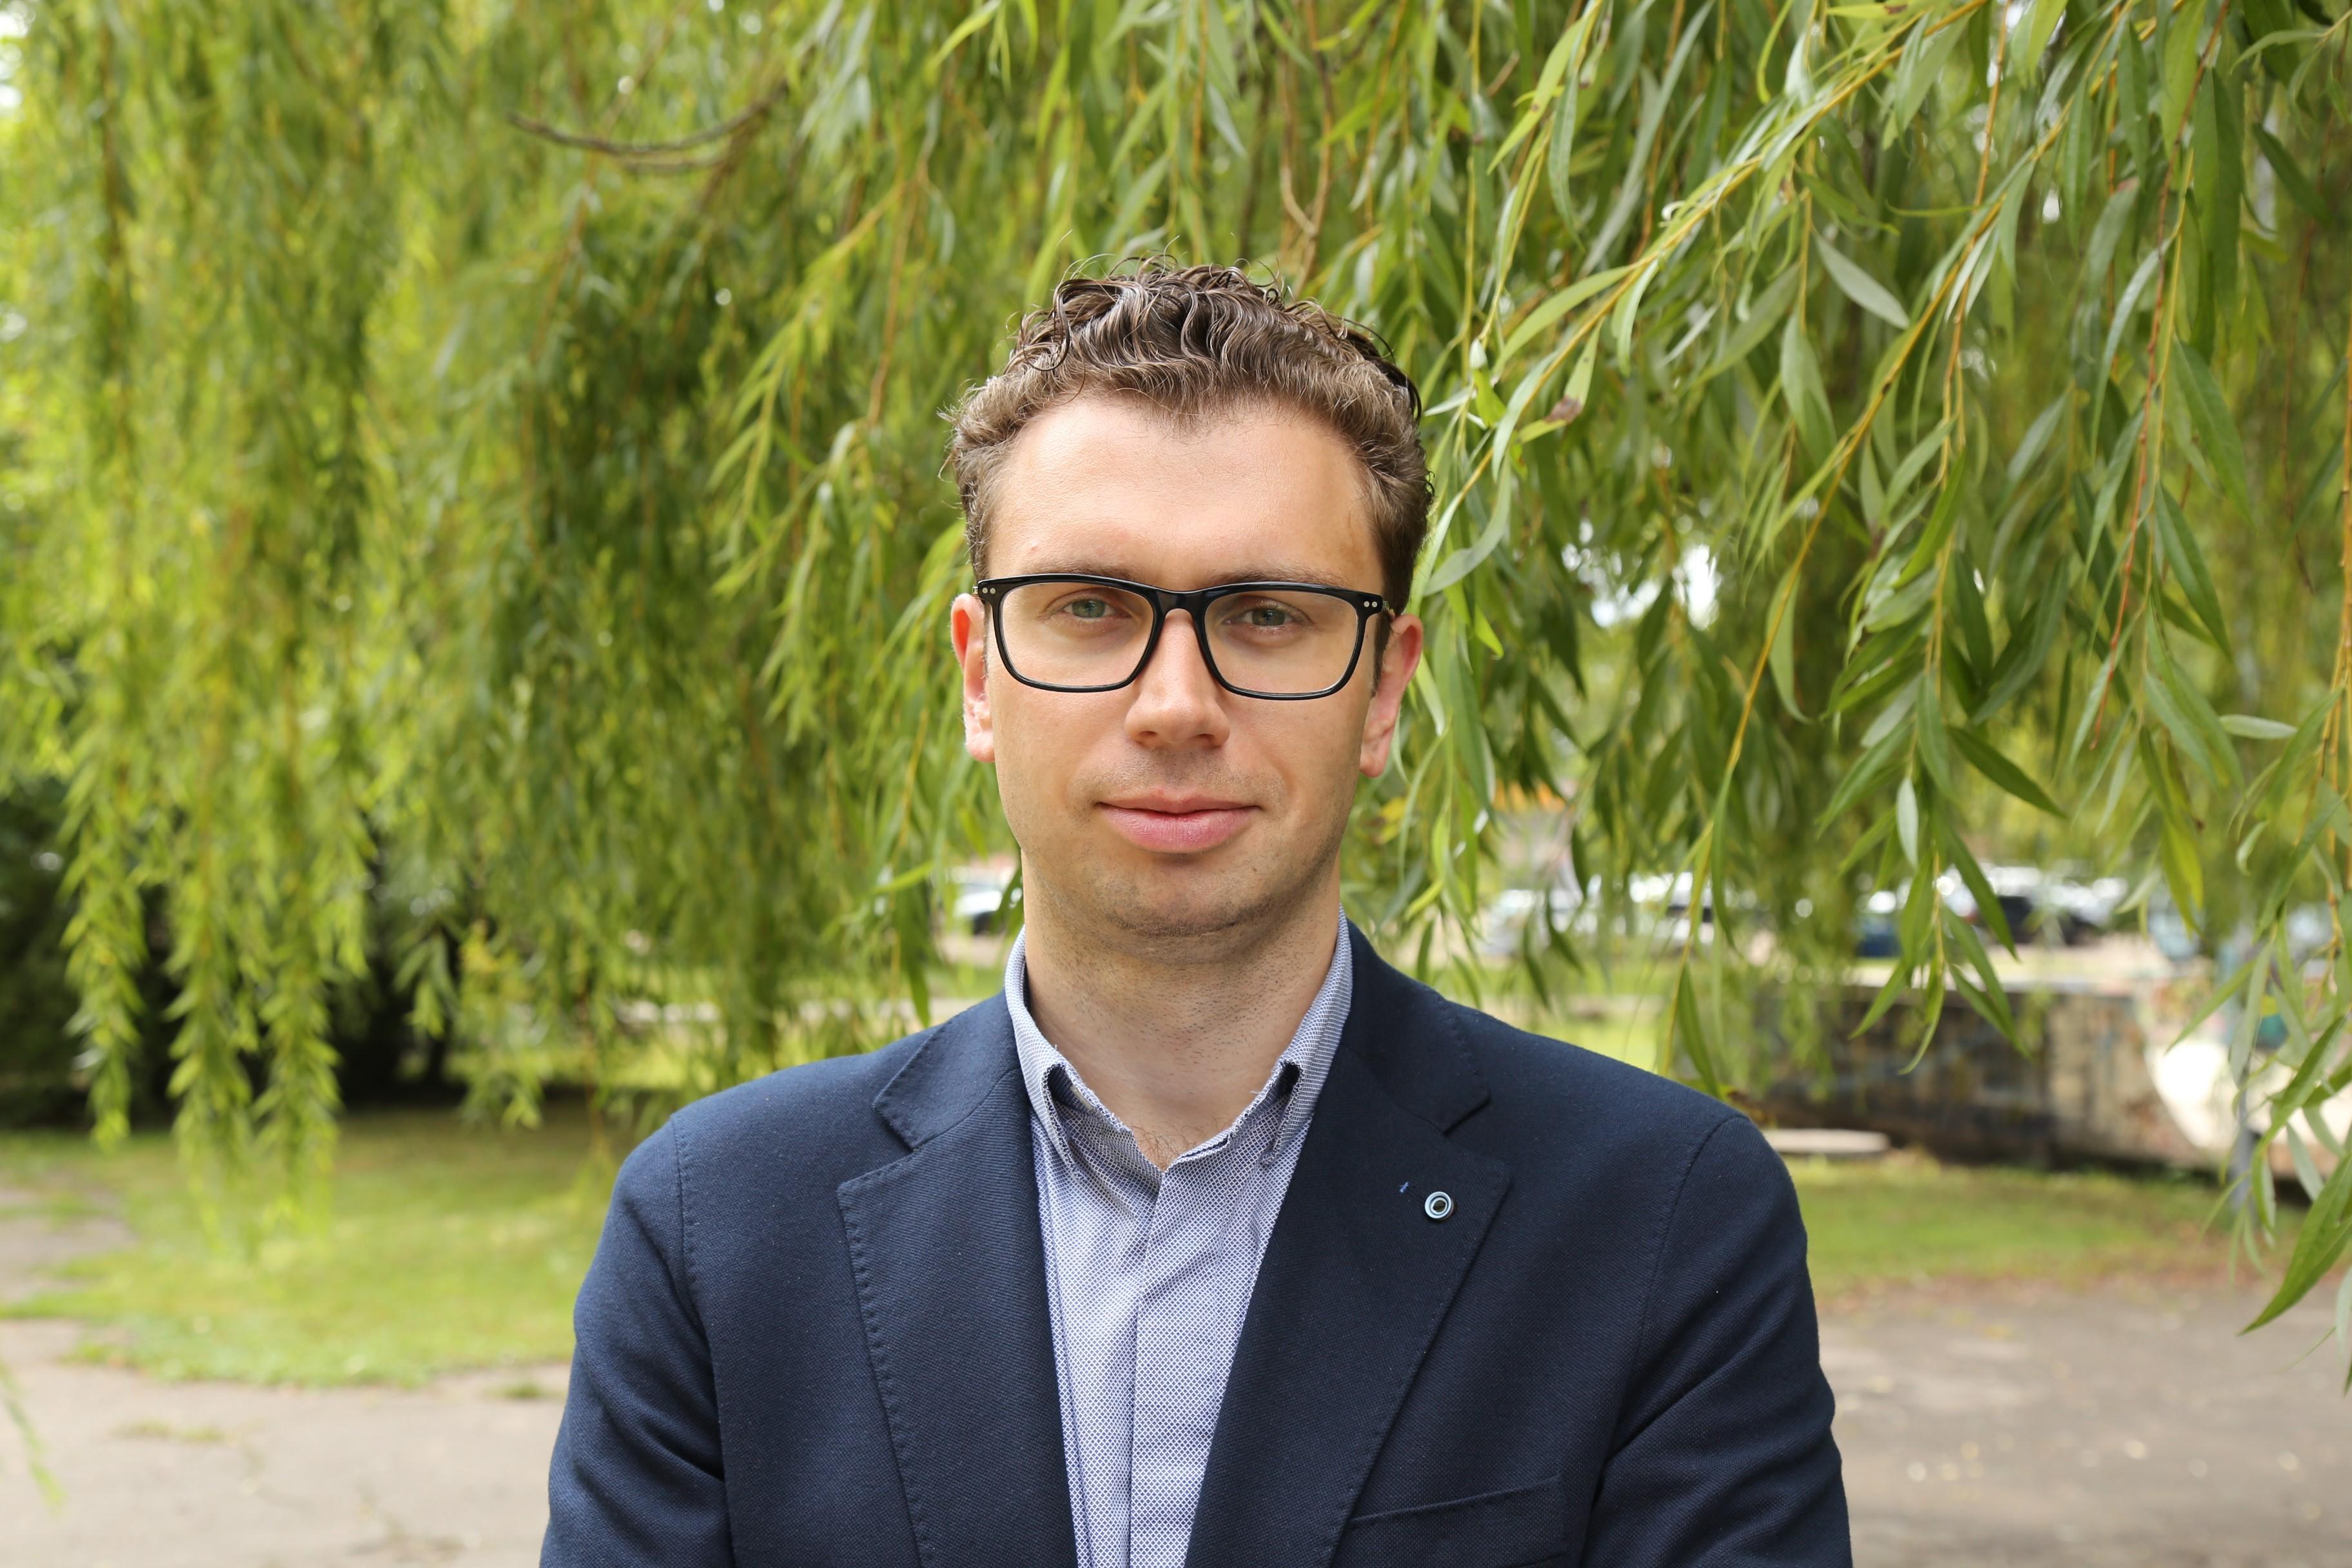 Staņislavs Hilčuks